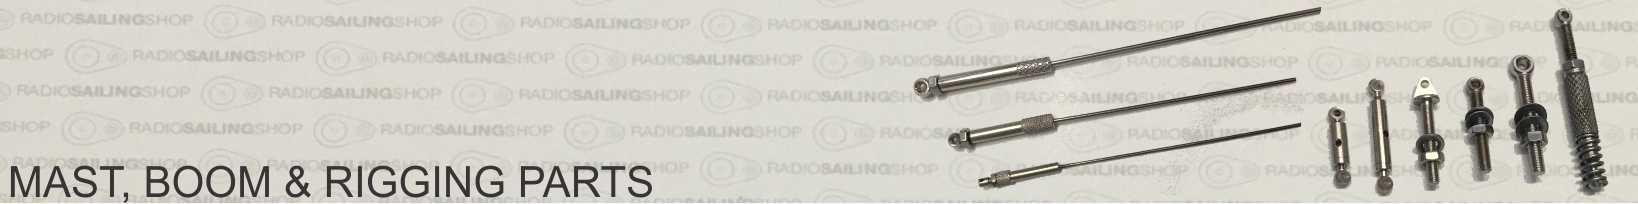 MAST, BOOM & RIGGING PARTS : Radio Sailing Shop